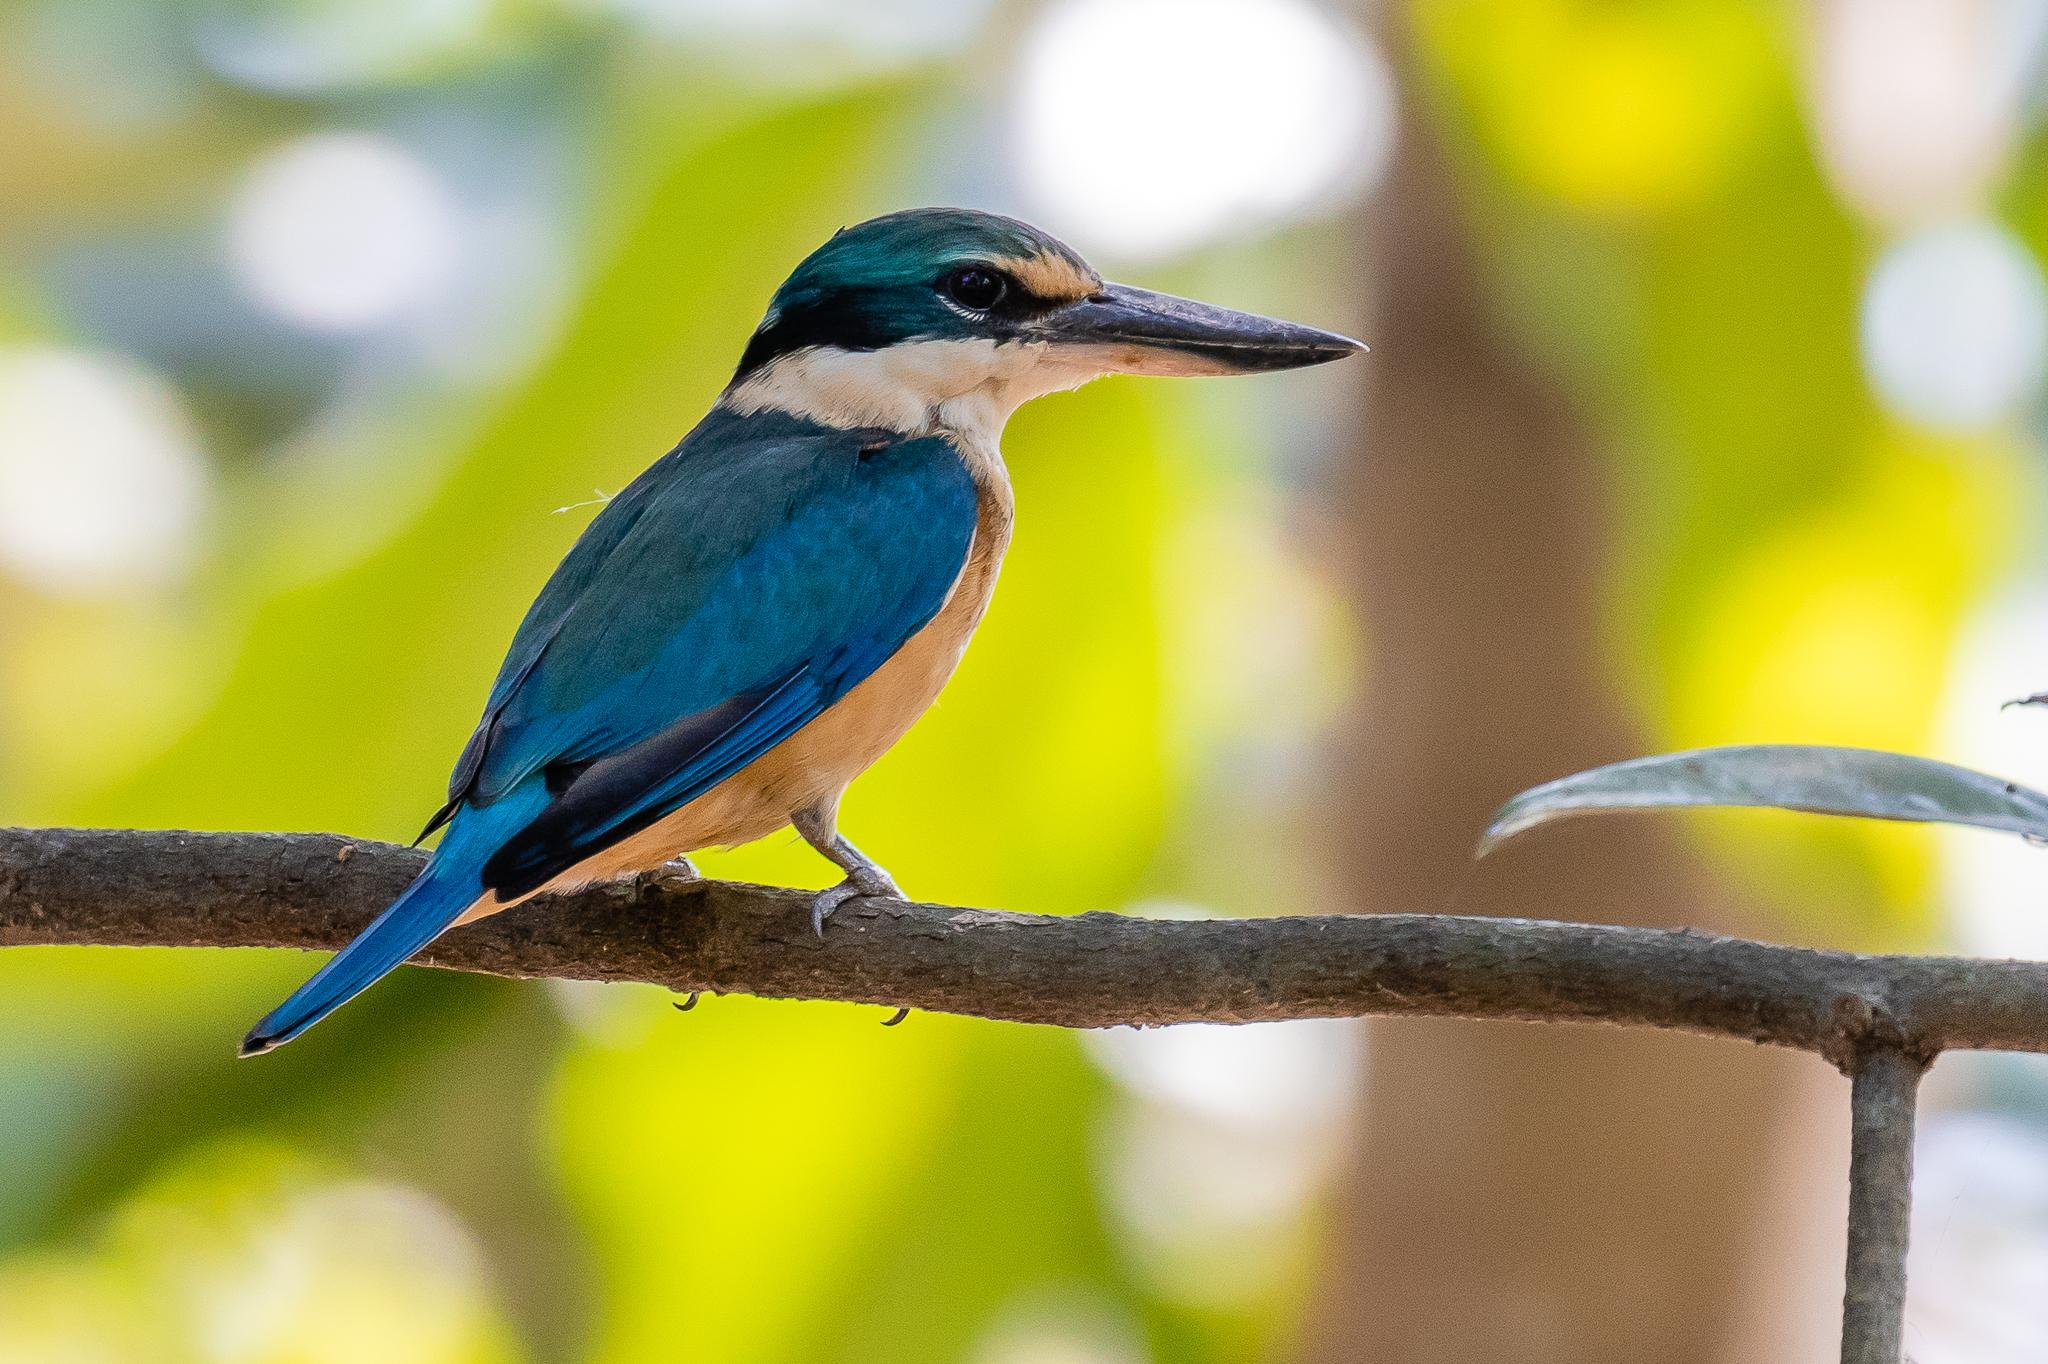 Sacred Kingfisher seen at Howard Springs Nature Park near Darwin, NT.